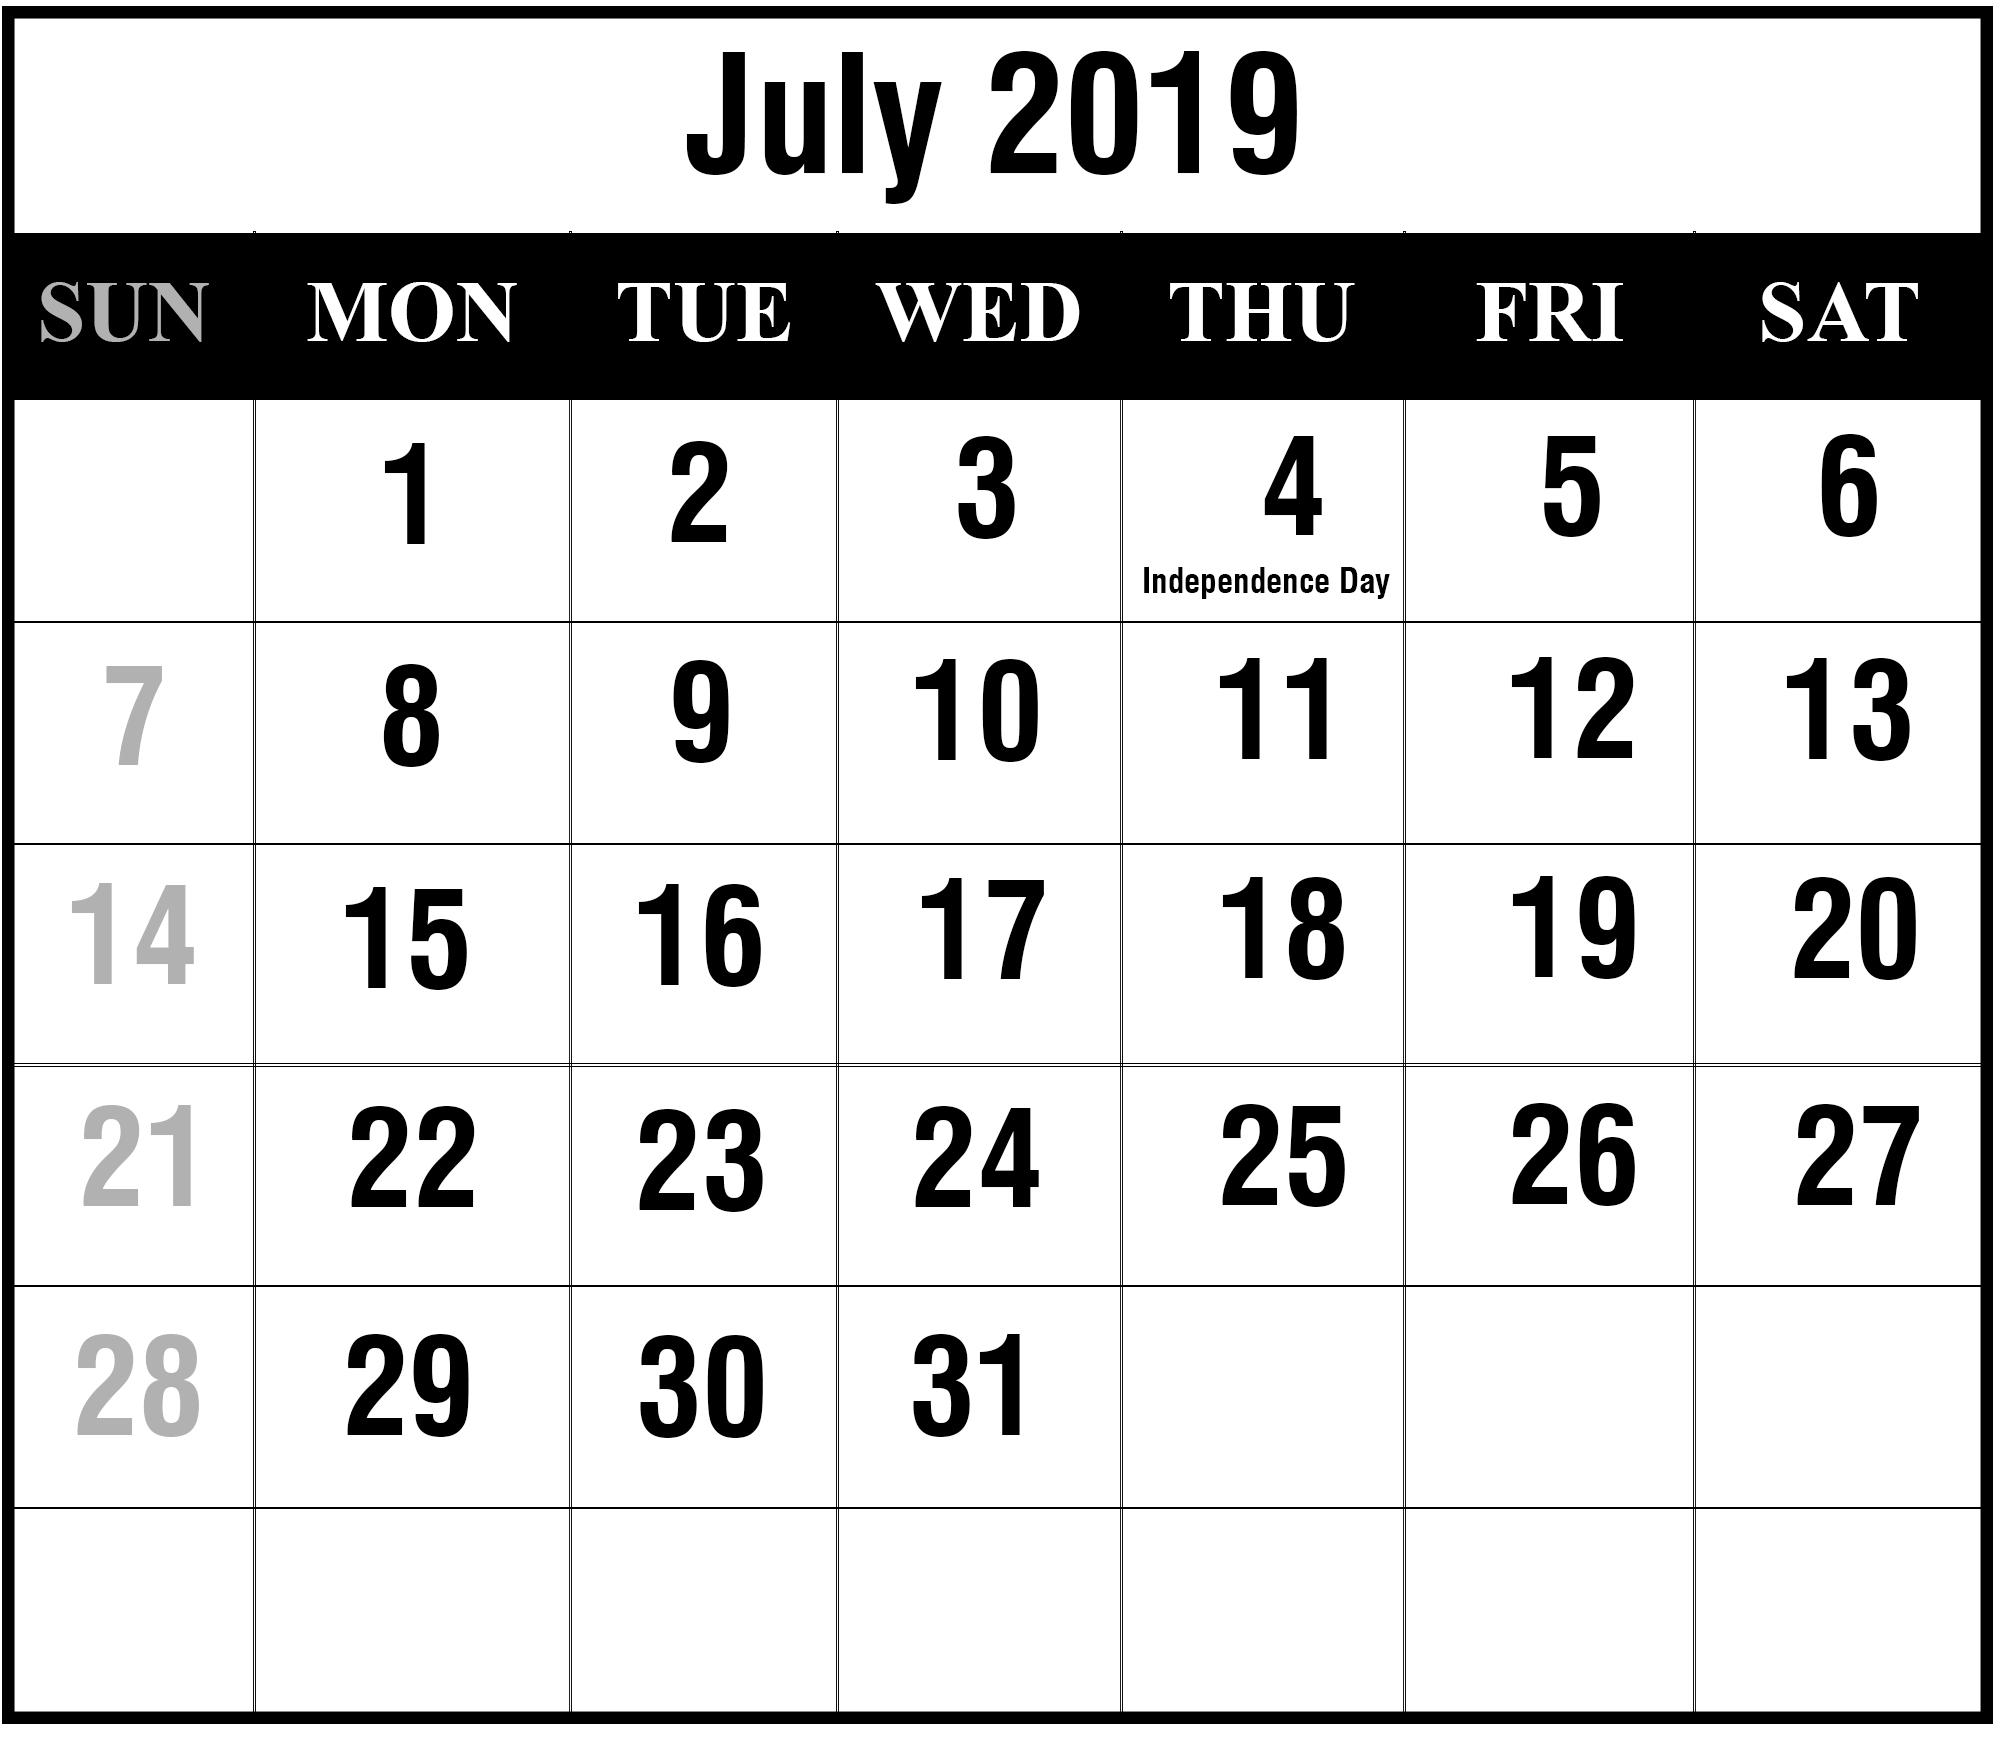 July 2019 Calendar Printable | July Blank Calendar Template July 1 2019 Calendar